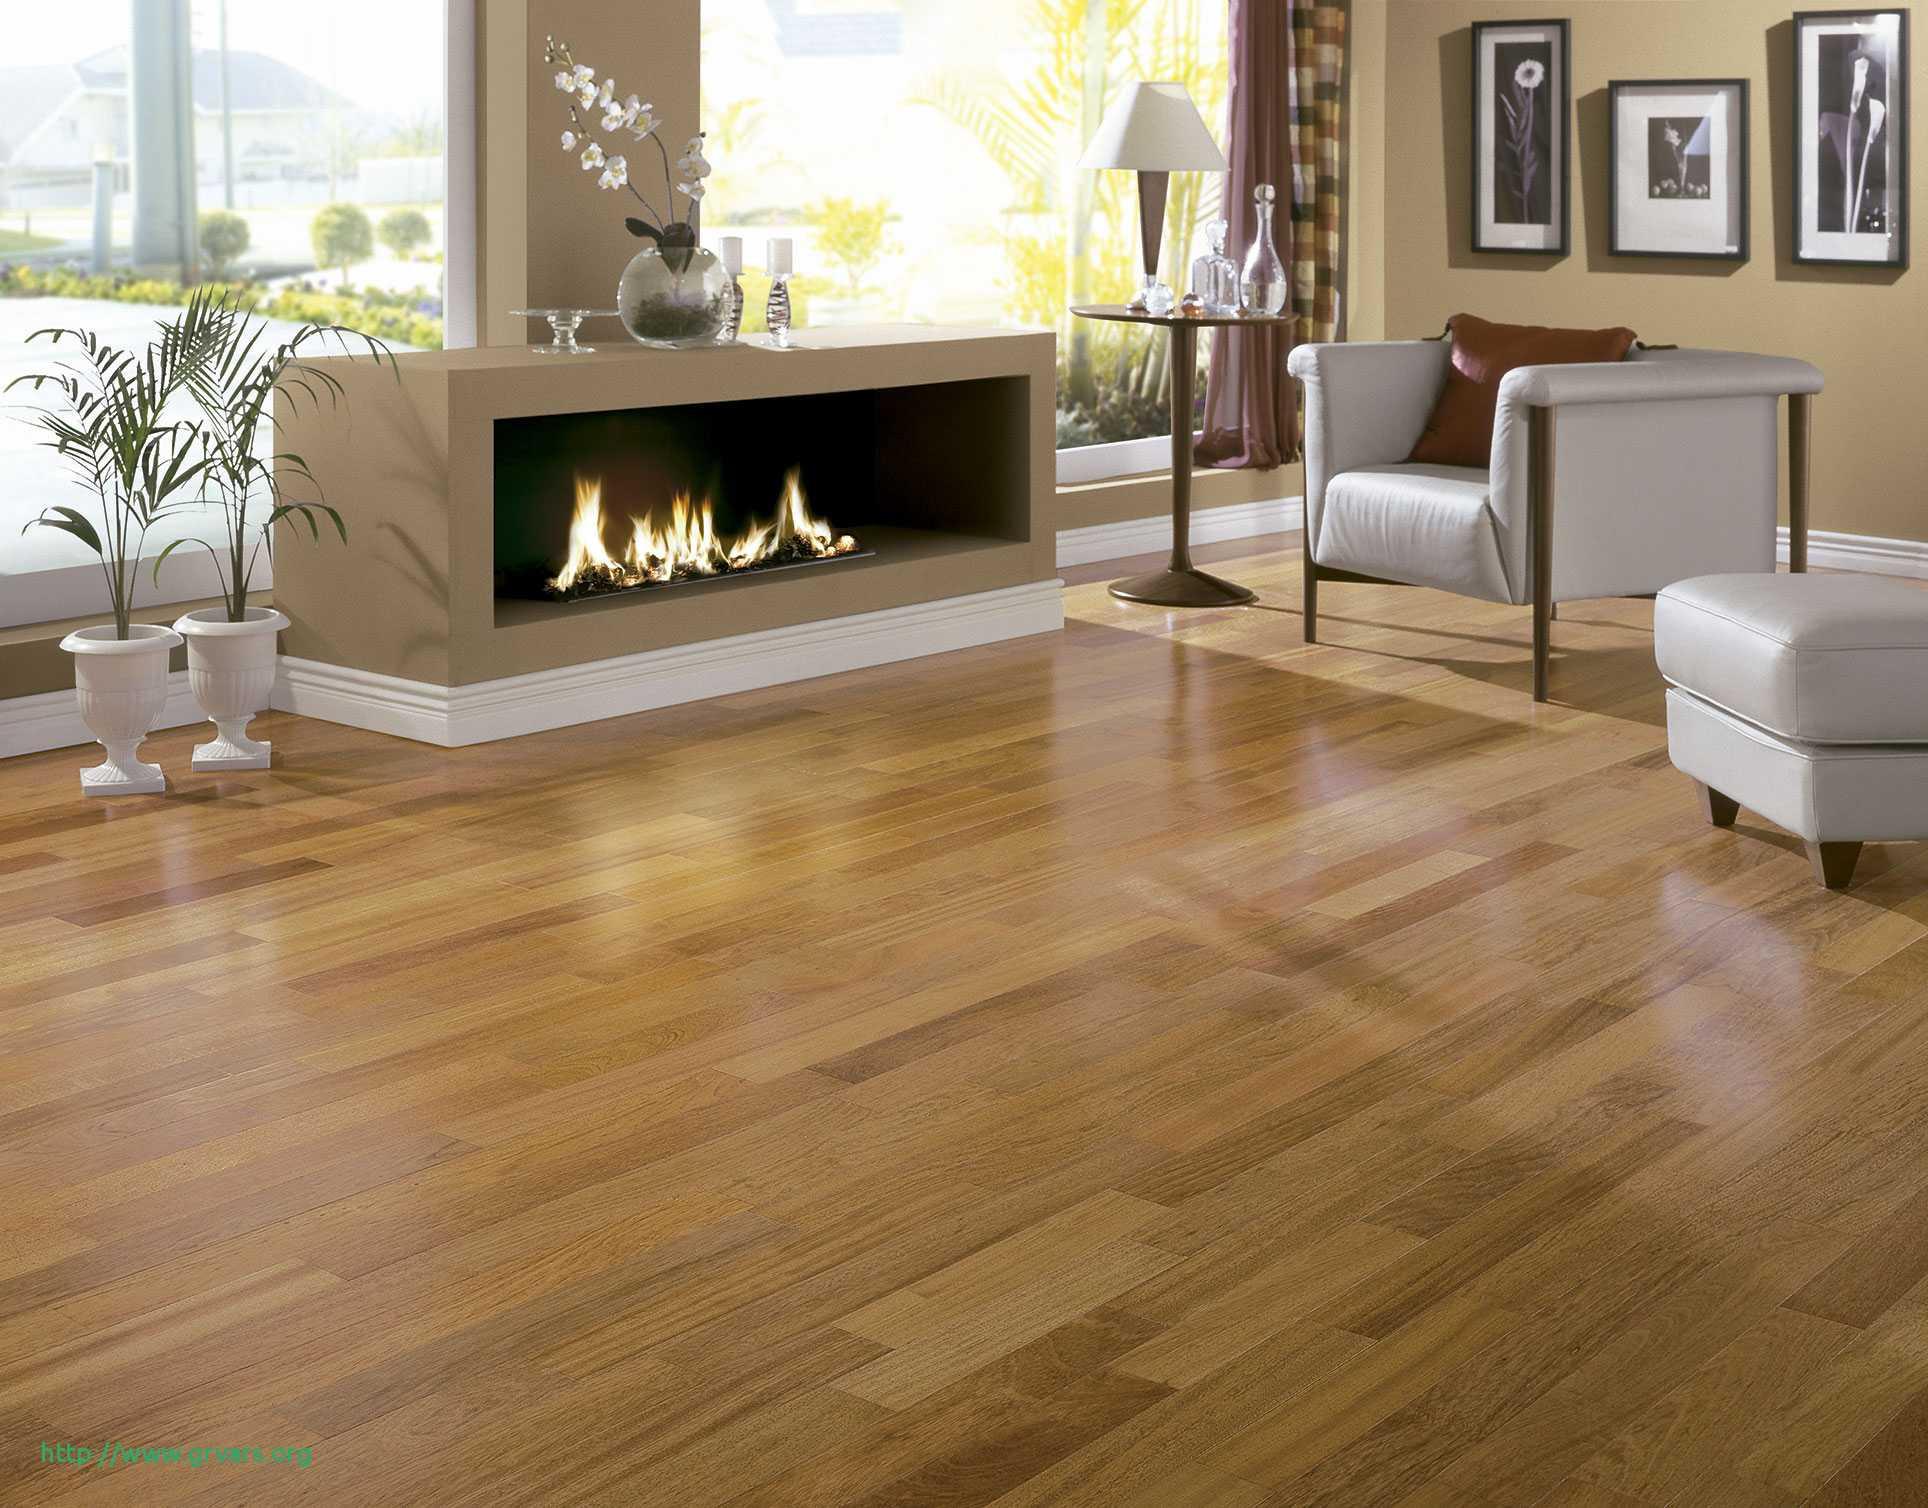 Fireplace Backsplash Fresh 16 attractive Bedrooms with Hardwood Floors